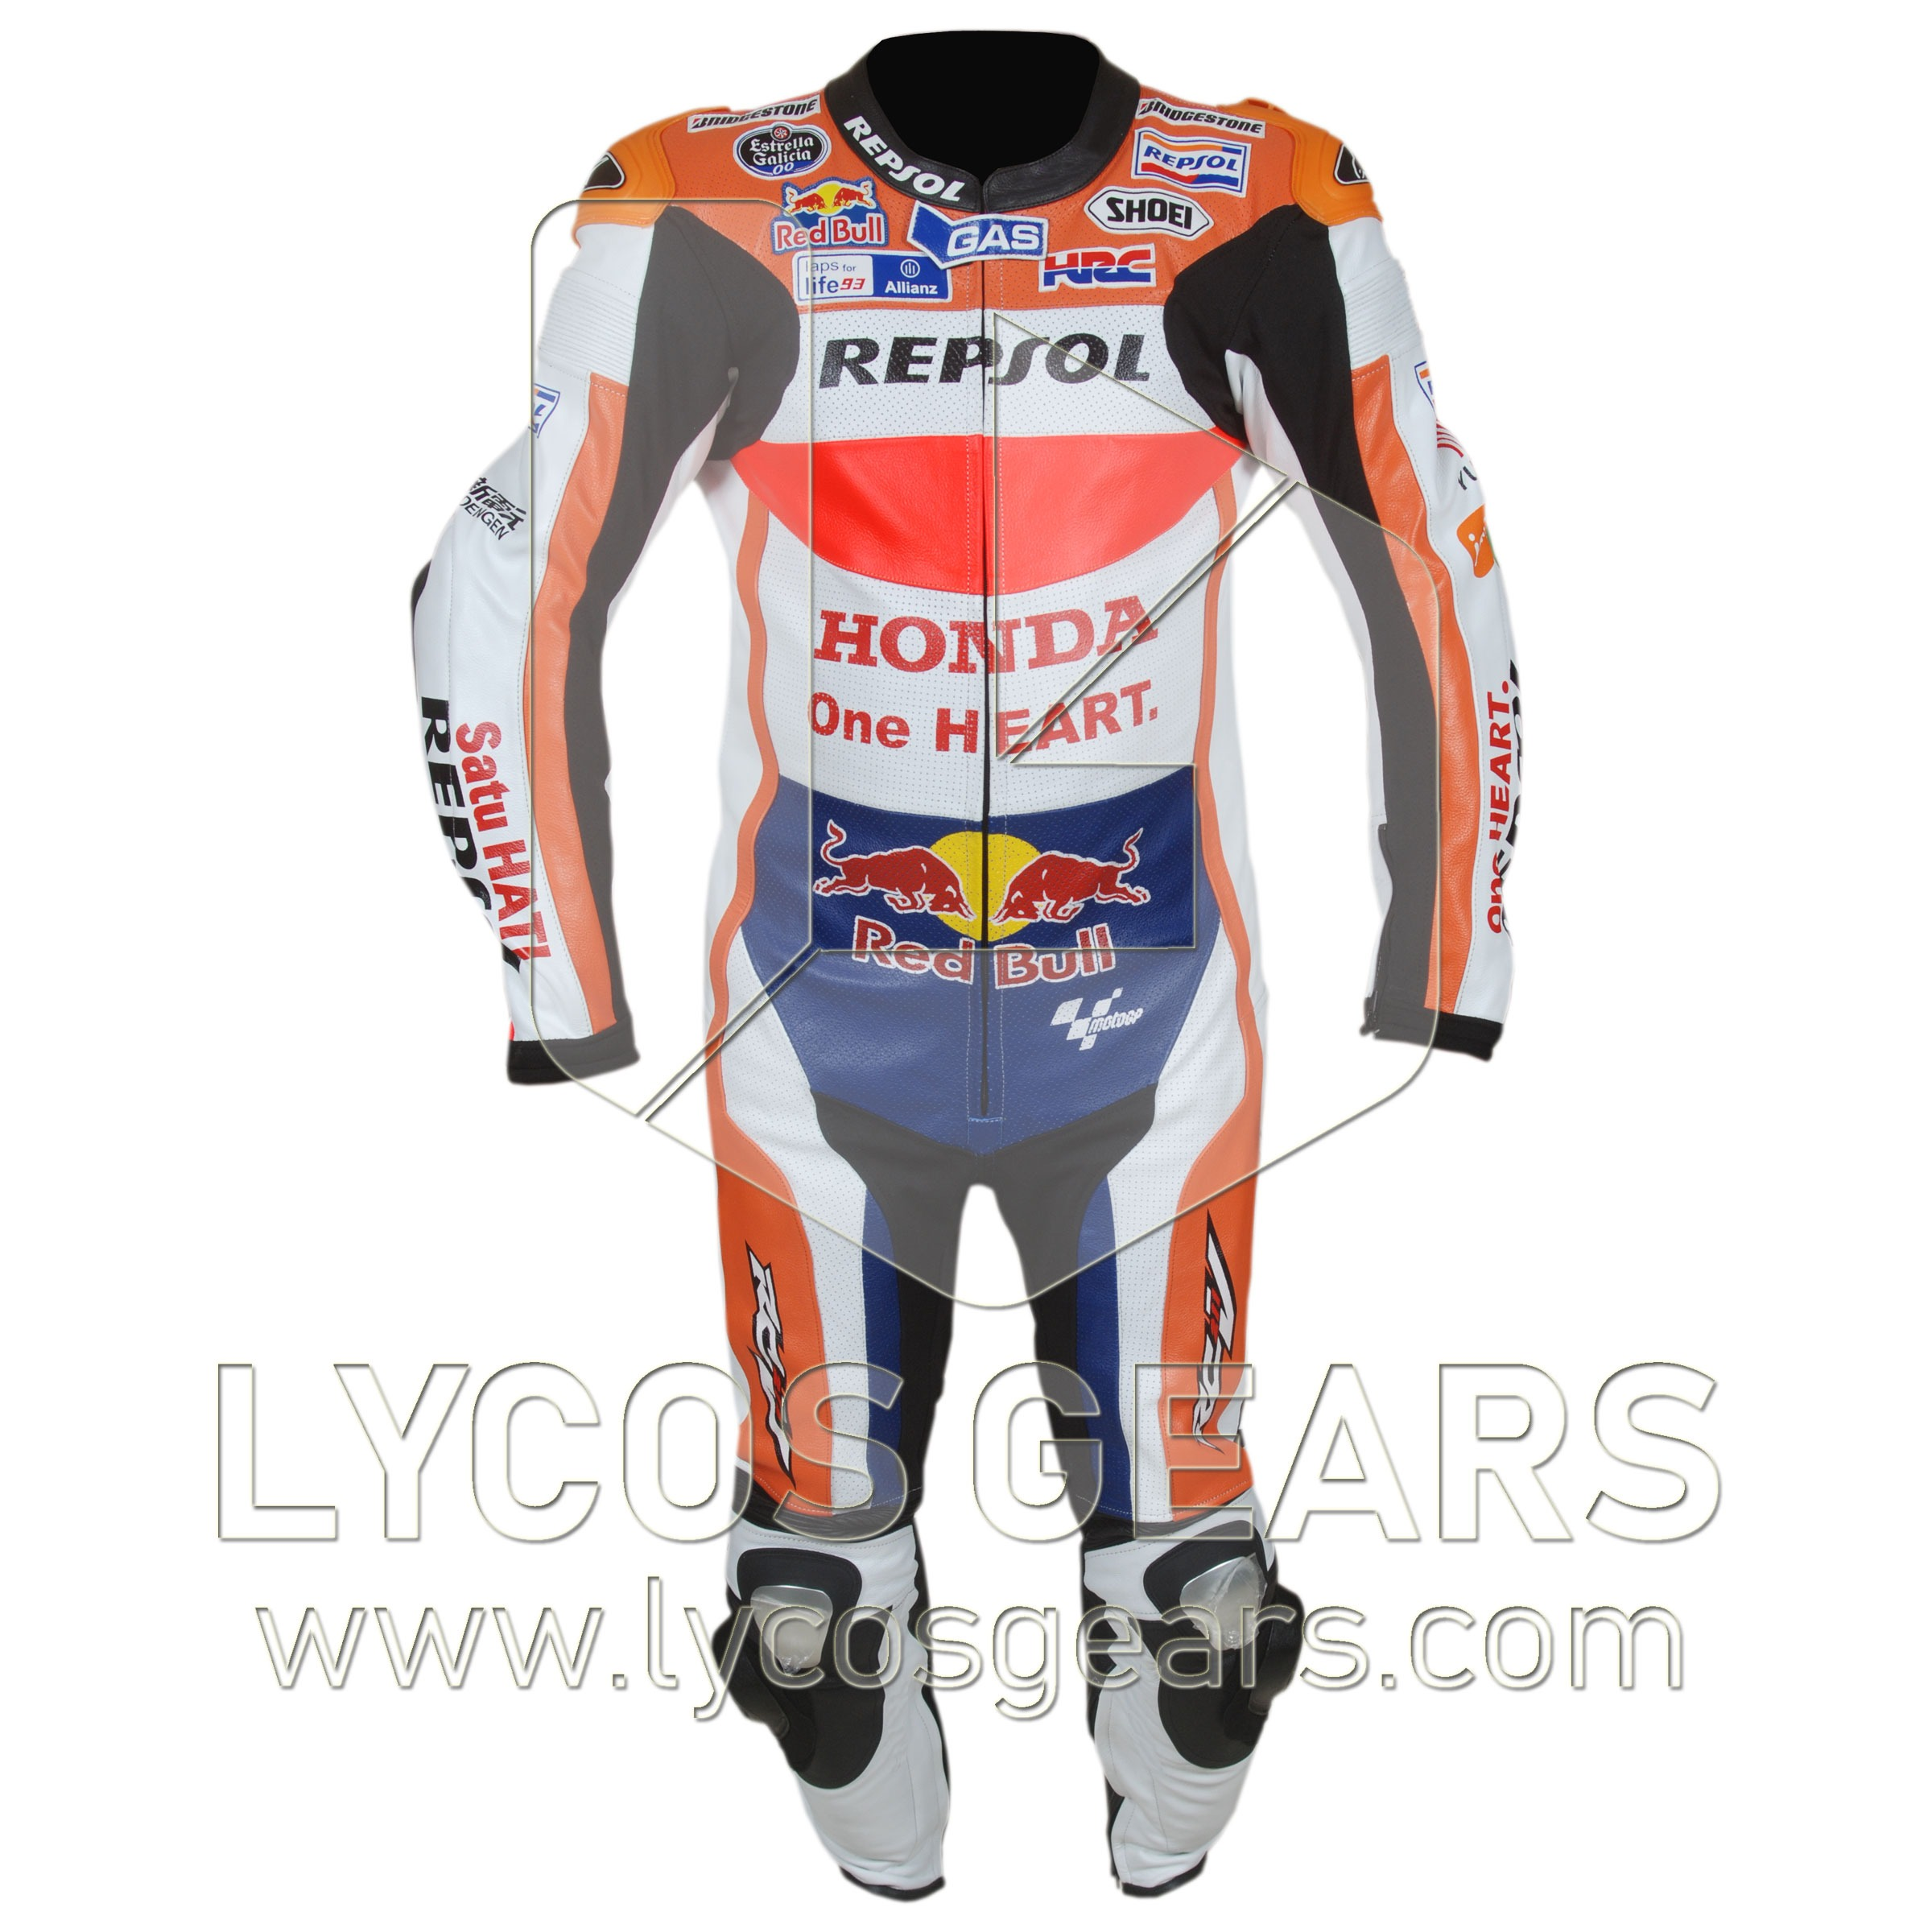 marc marquez honda repsol motorcycle suit 2016 lycos gears. Black Bedroom Furniture Sets. Home Design Ideas